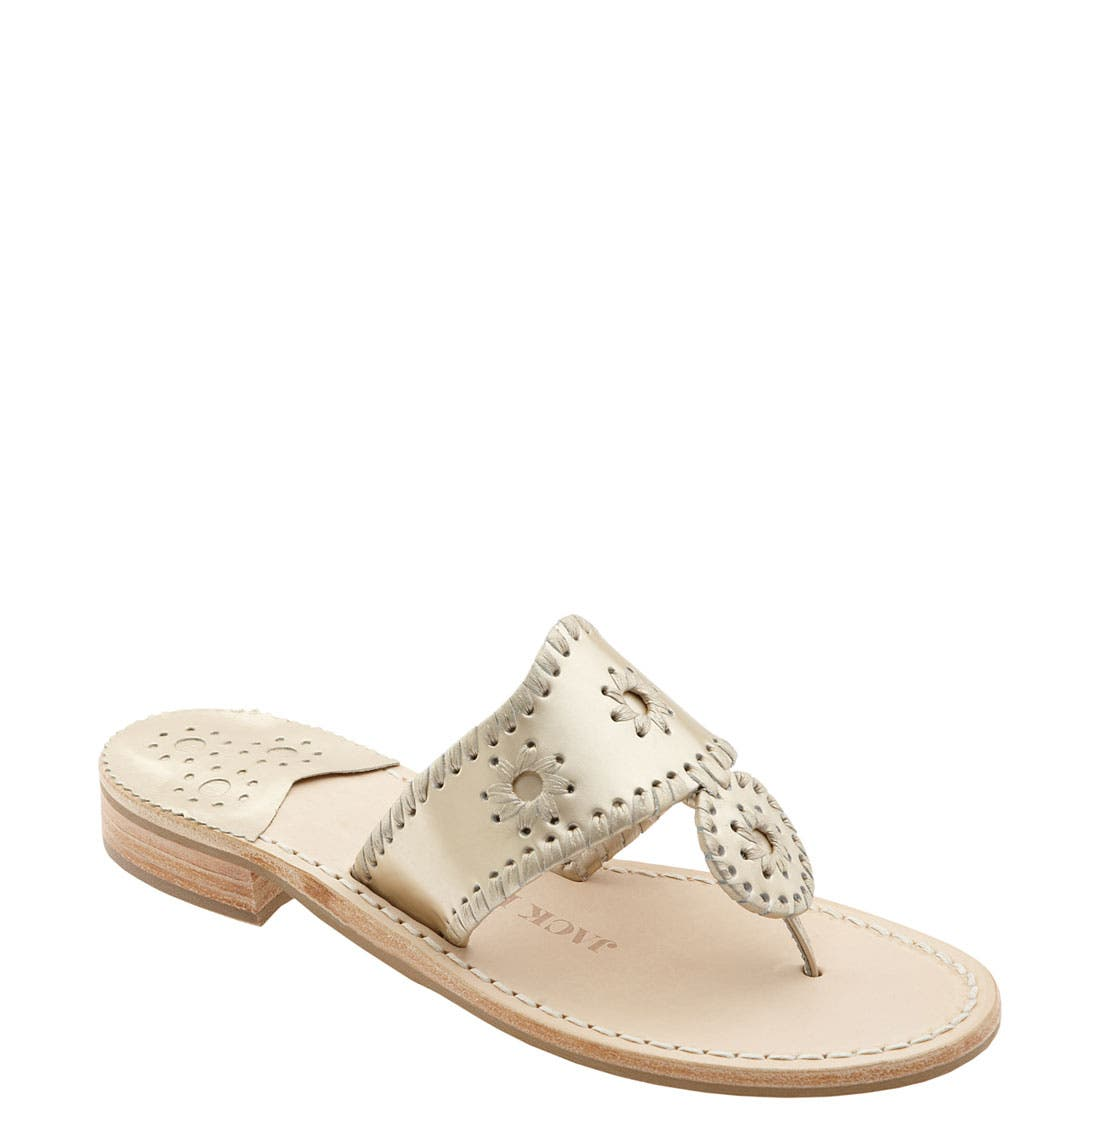 Palm Beach Whipstitch Thong Sandal in Platinum